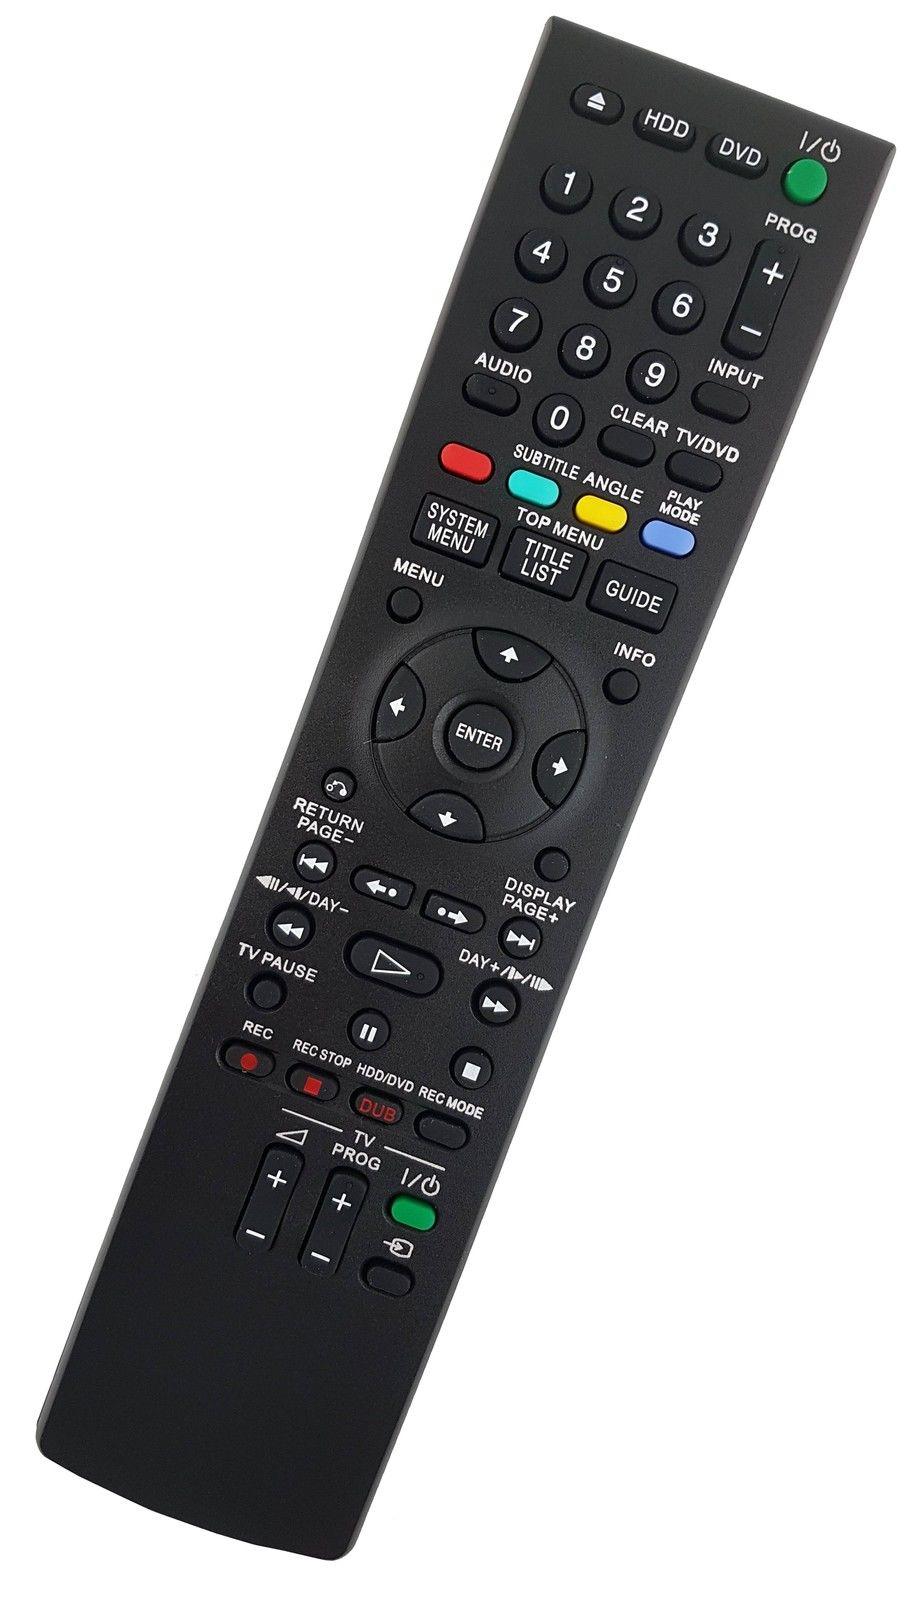 Service Remote Control For Sony J-6090-203-A J6090203A RDR-HX650 RDR-HX750 RDR-HX950 RDR-HX780 RDR-HX680 DVD Service Recorder